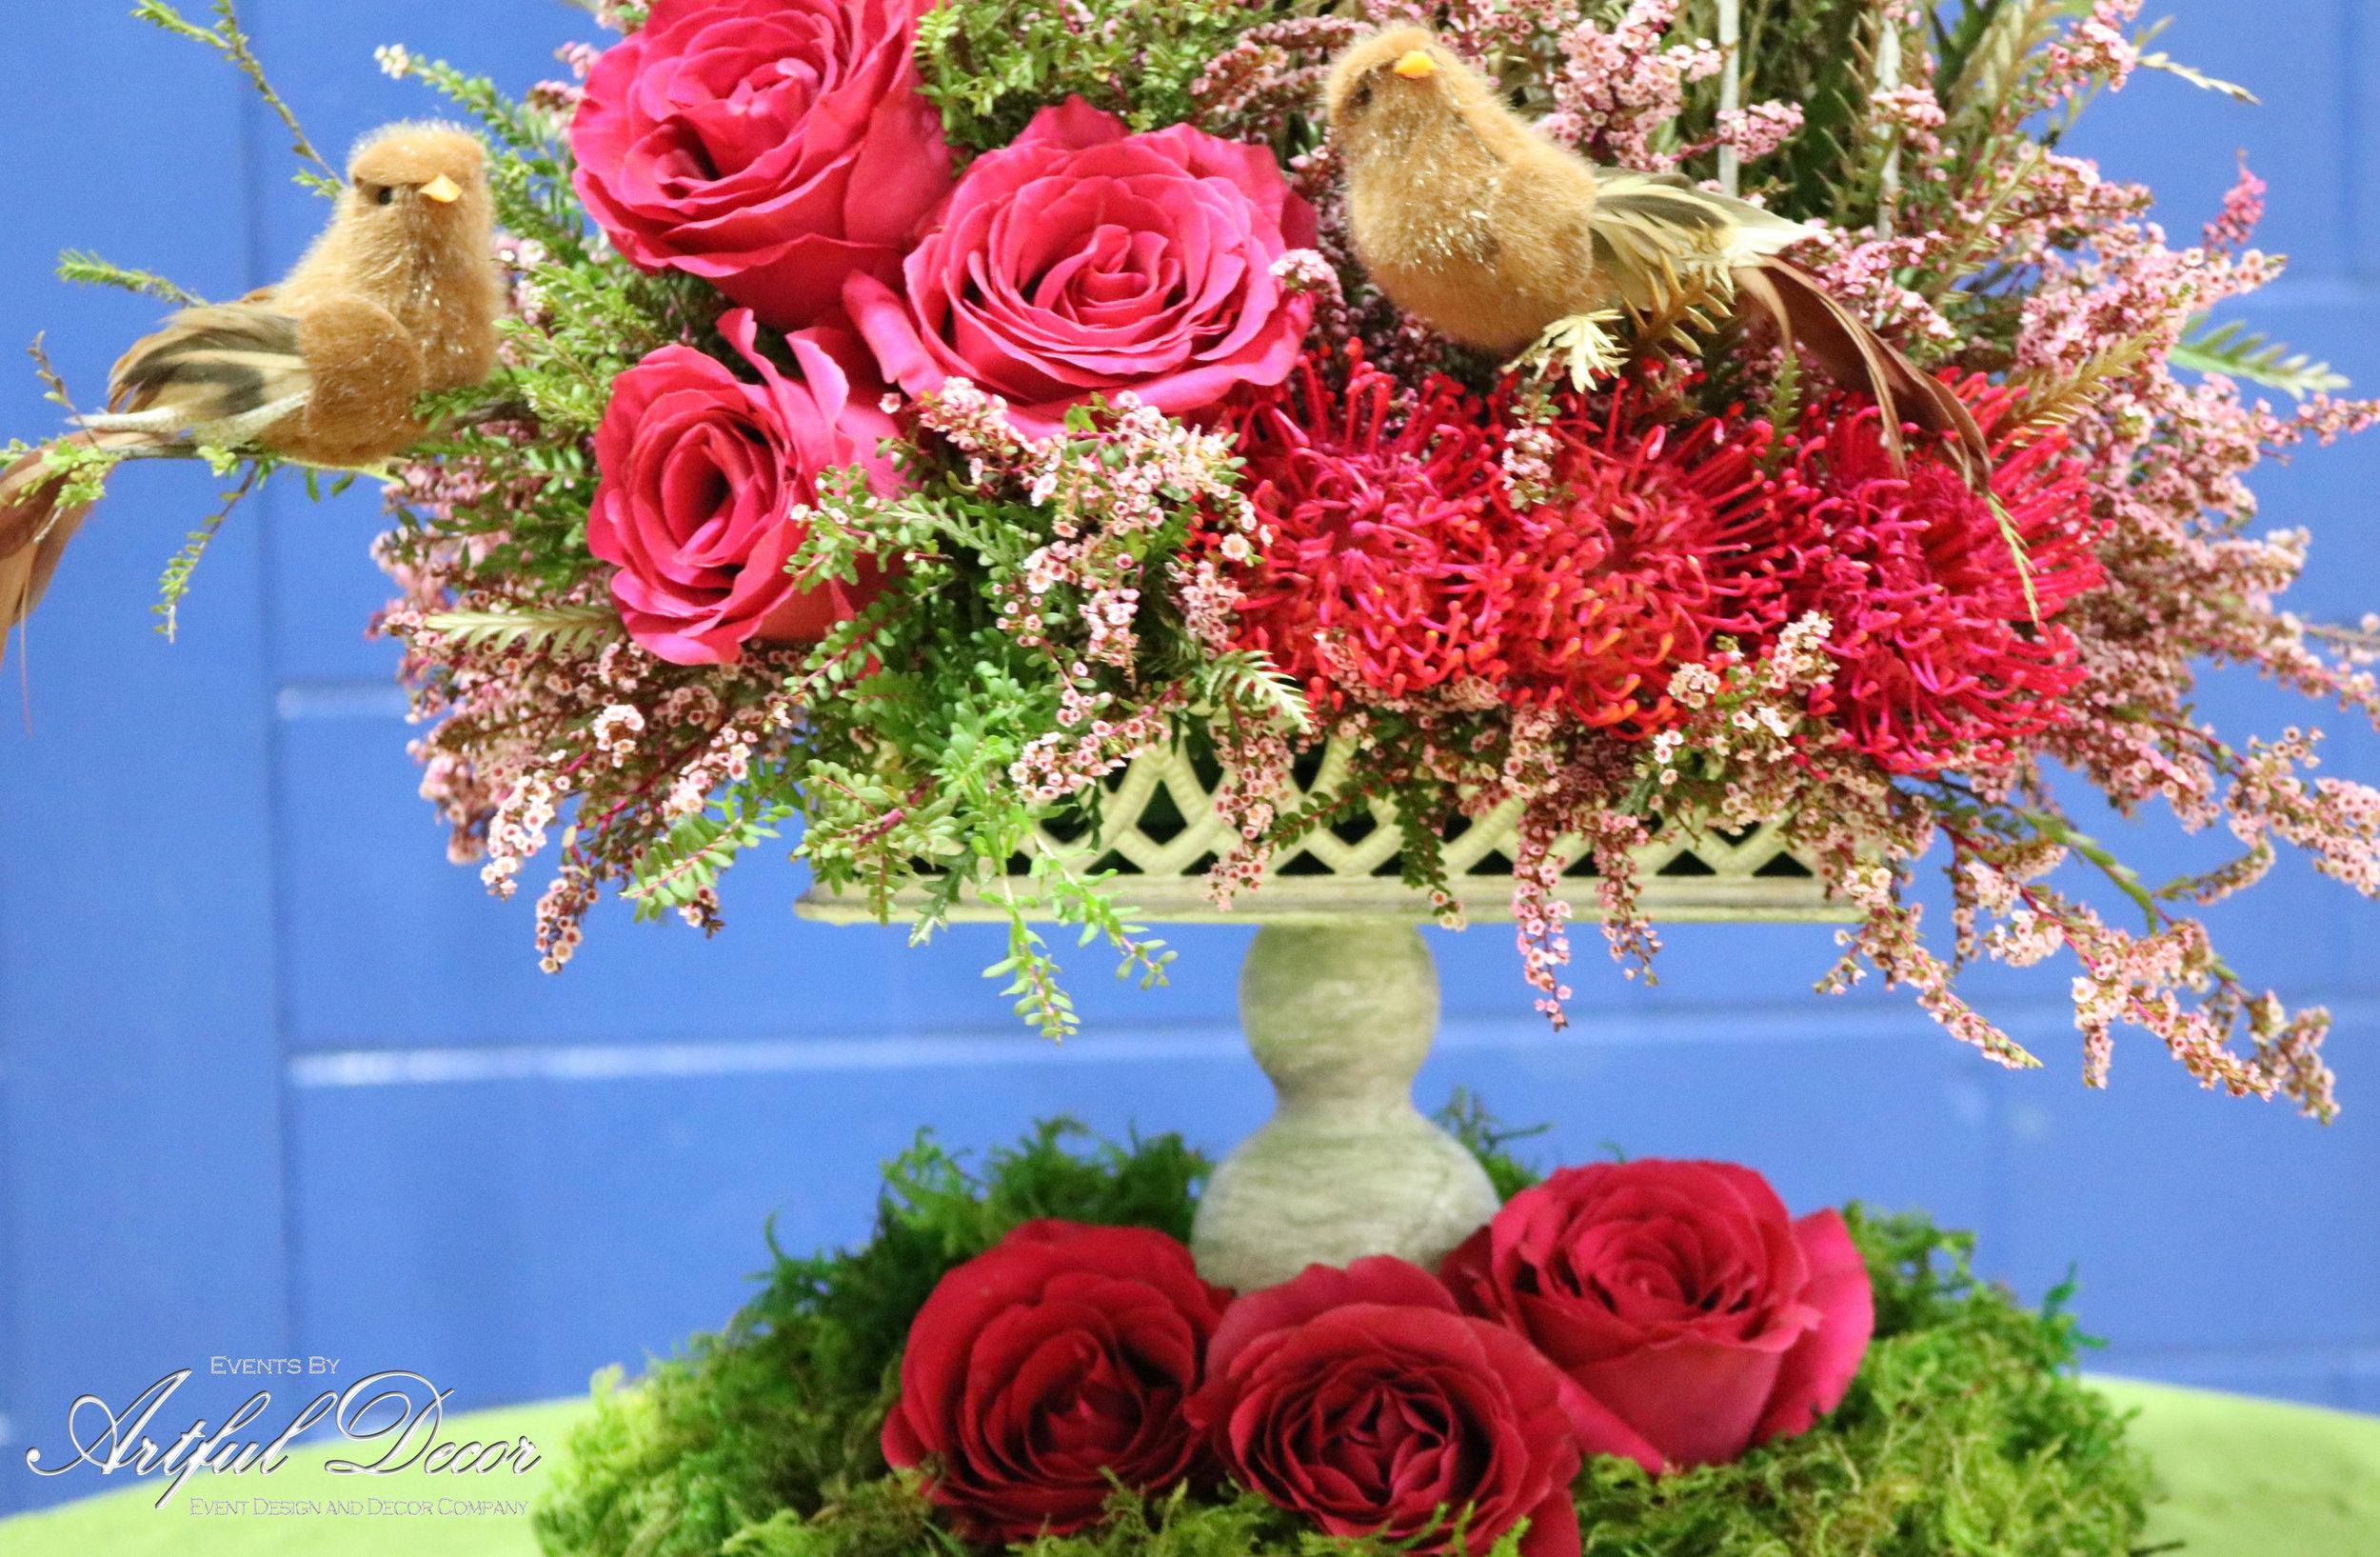 Bridal Fair 2 Birds 4 Copyright.jpg